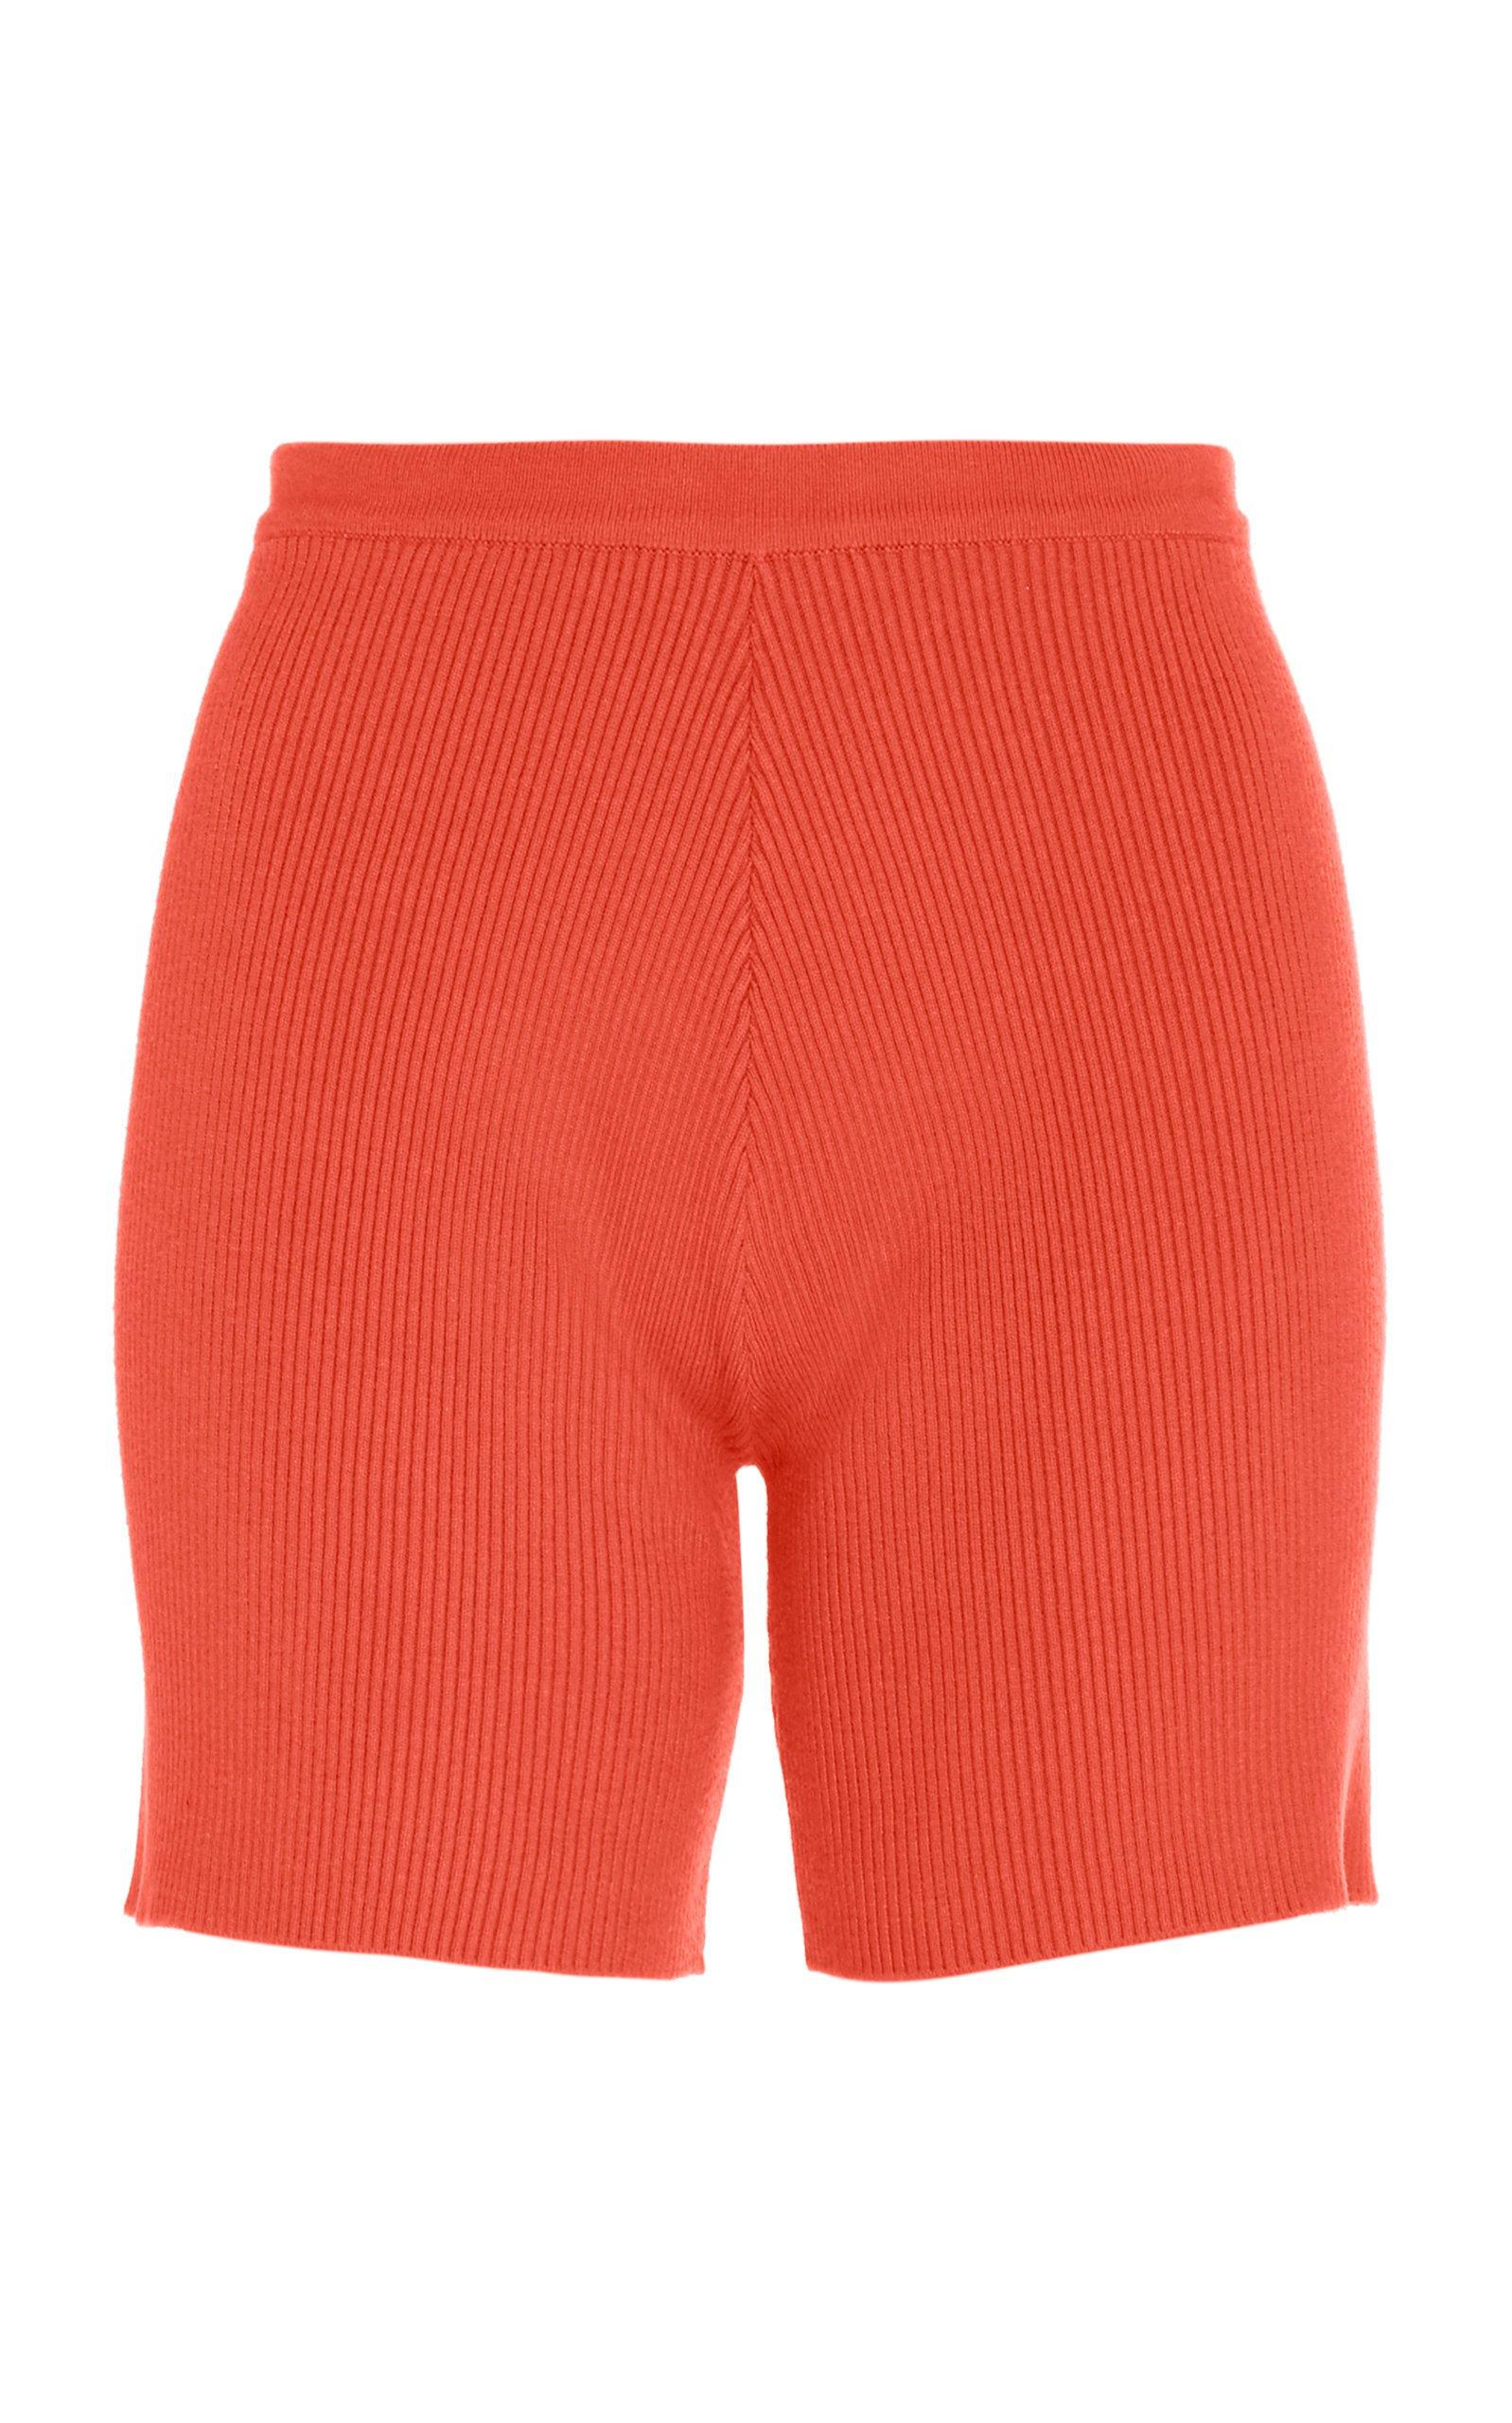 Apparis Penny Biker Shorts Size: XL